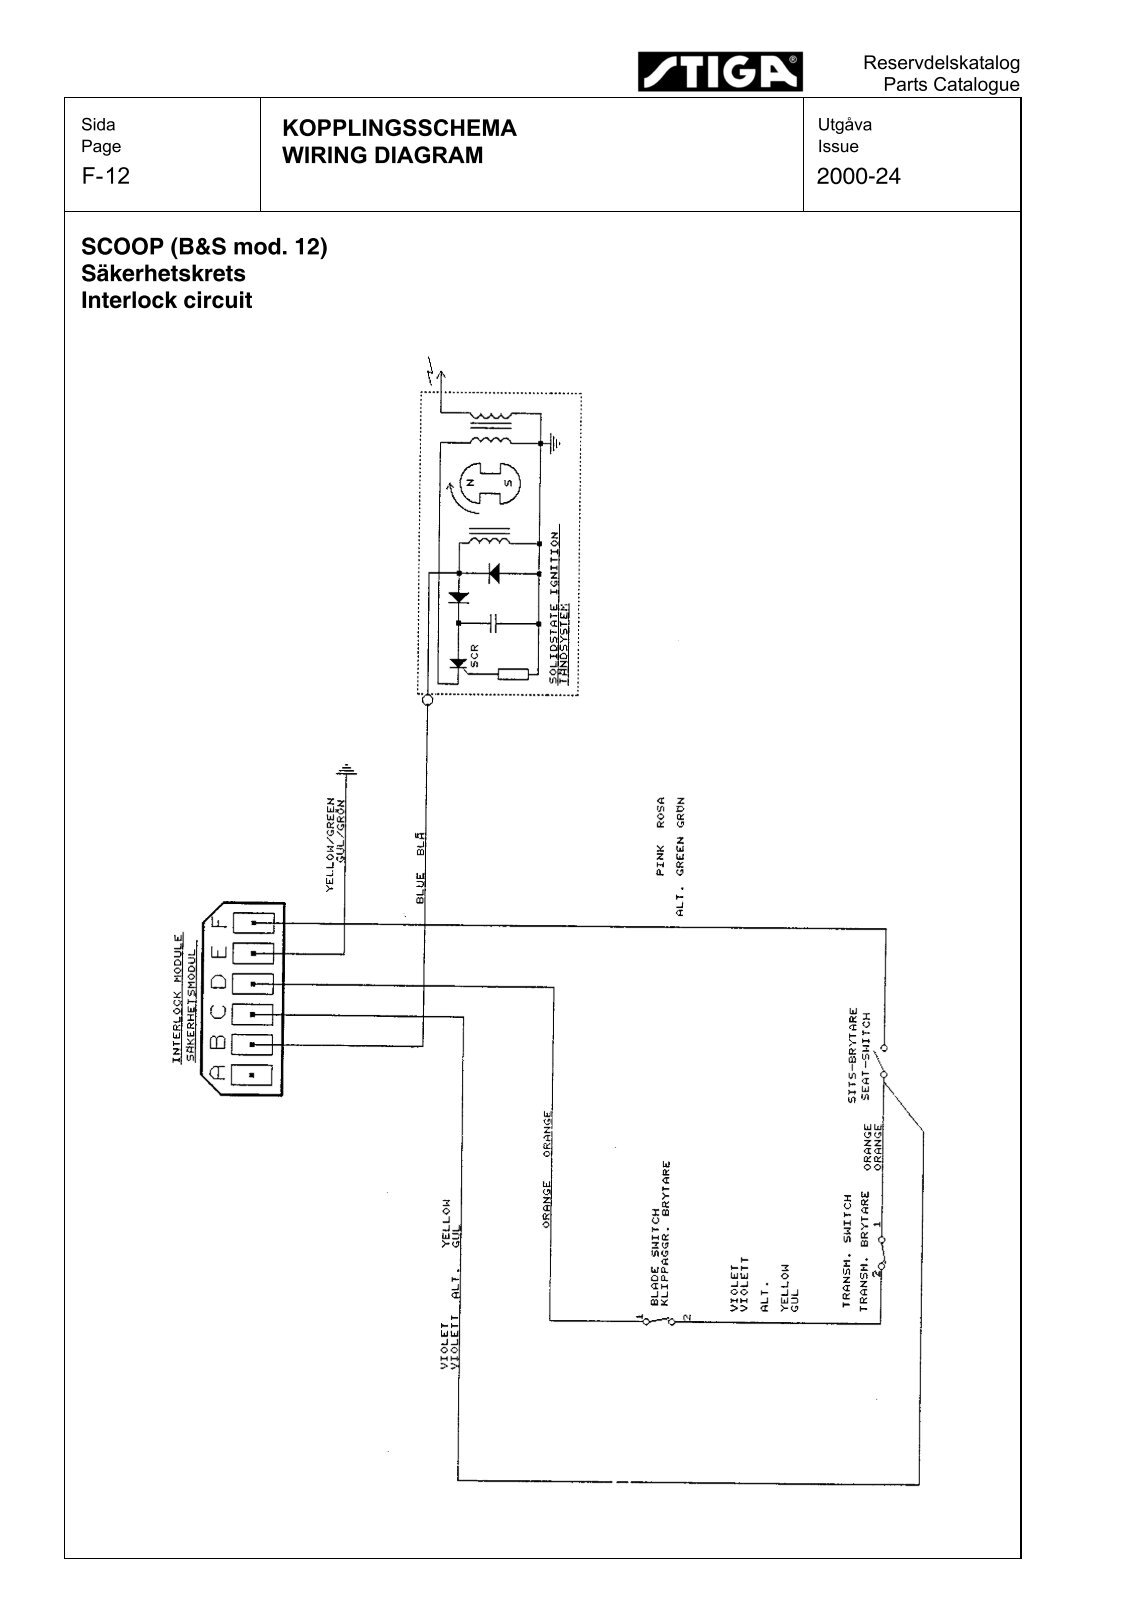 medium resolution of m1008 wiring diagram wiring schematics diagram rh wiring regdiy co cucv m1009 wiring diagram m1008 wiring diagram